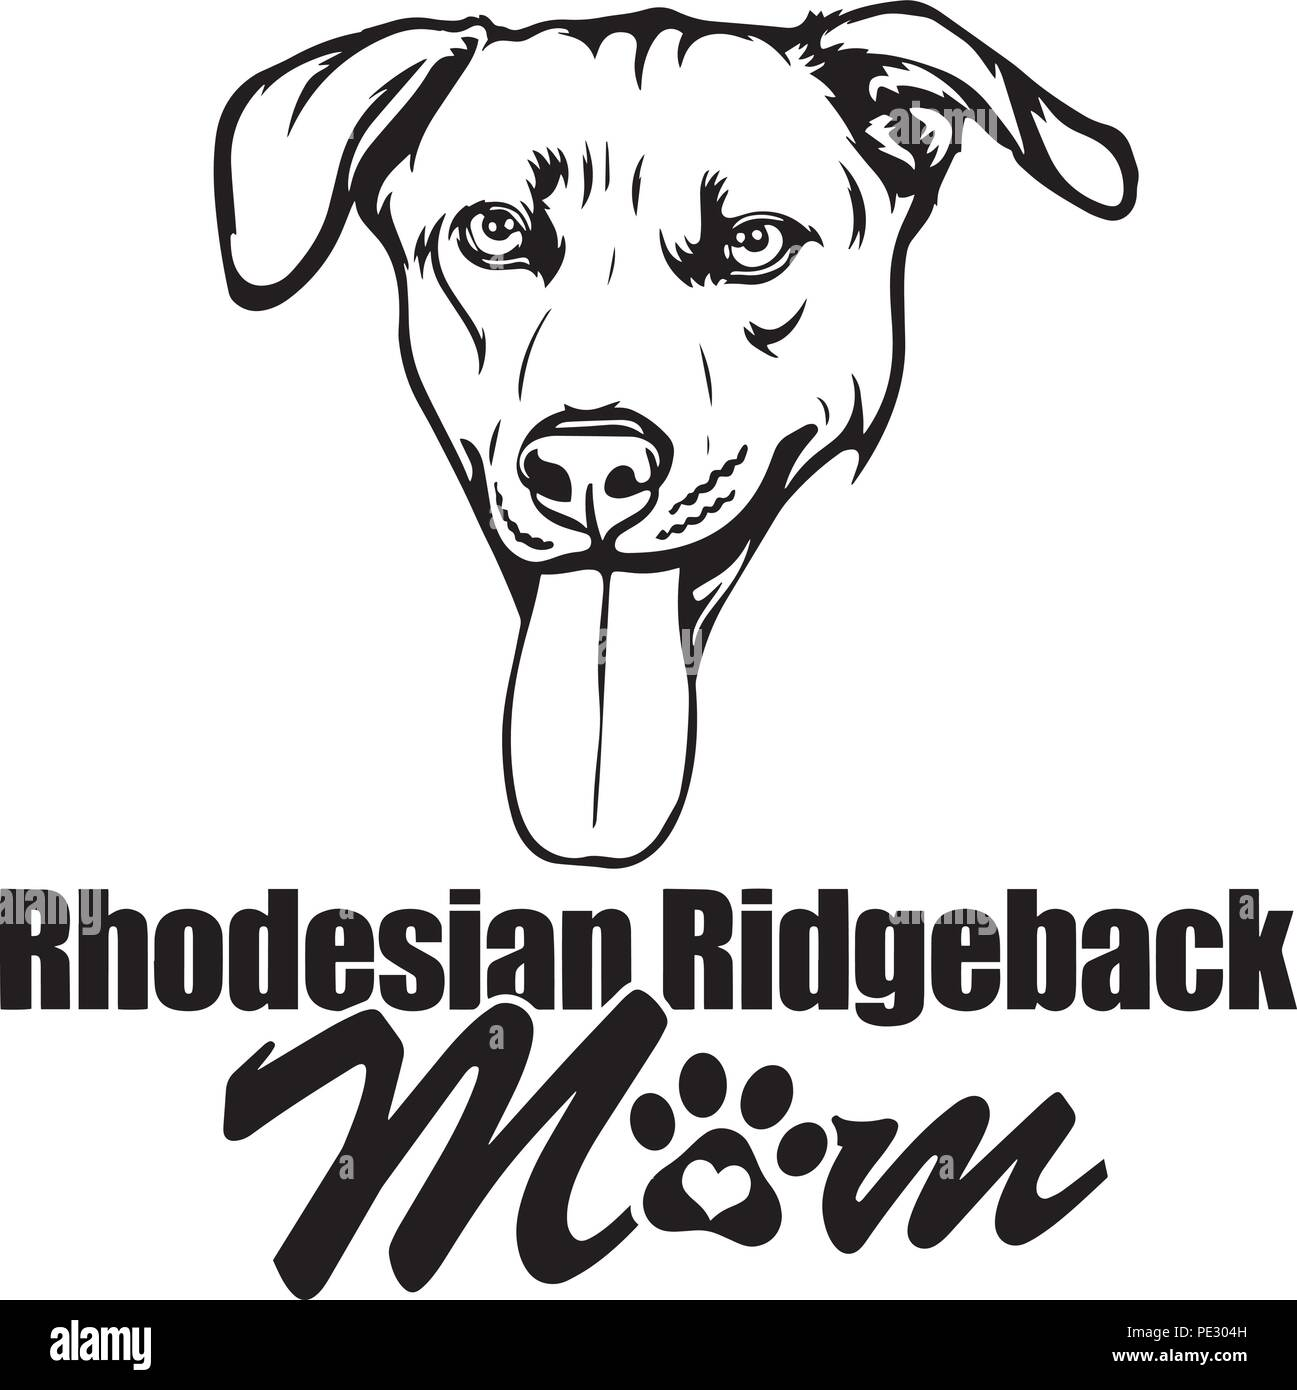 Rhodesian Ridgeback Dog Breed Pet Puppy Isolated Head Face Stock Vector